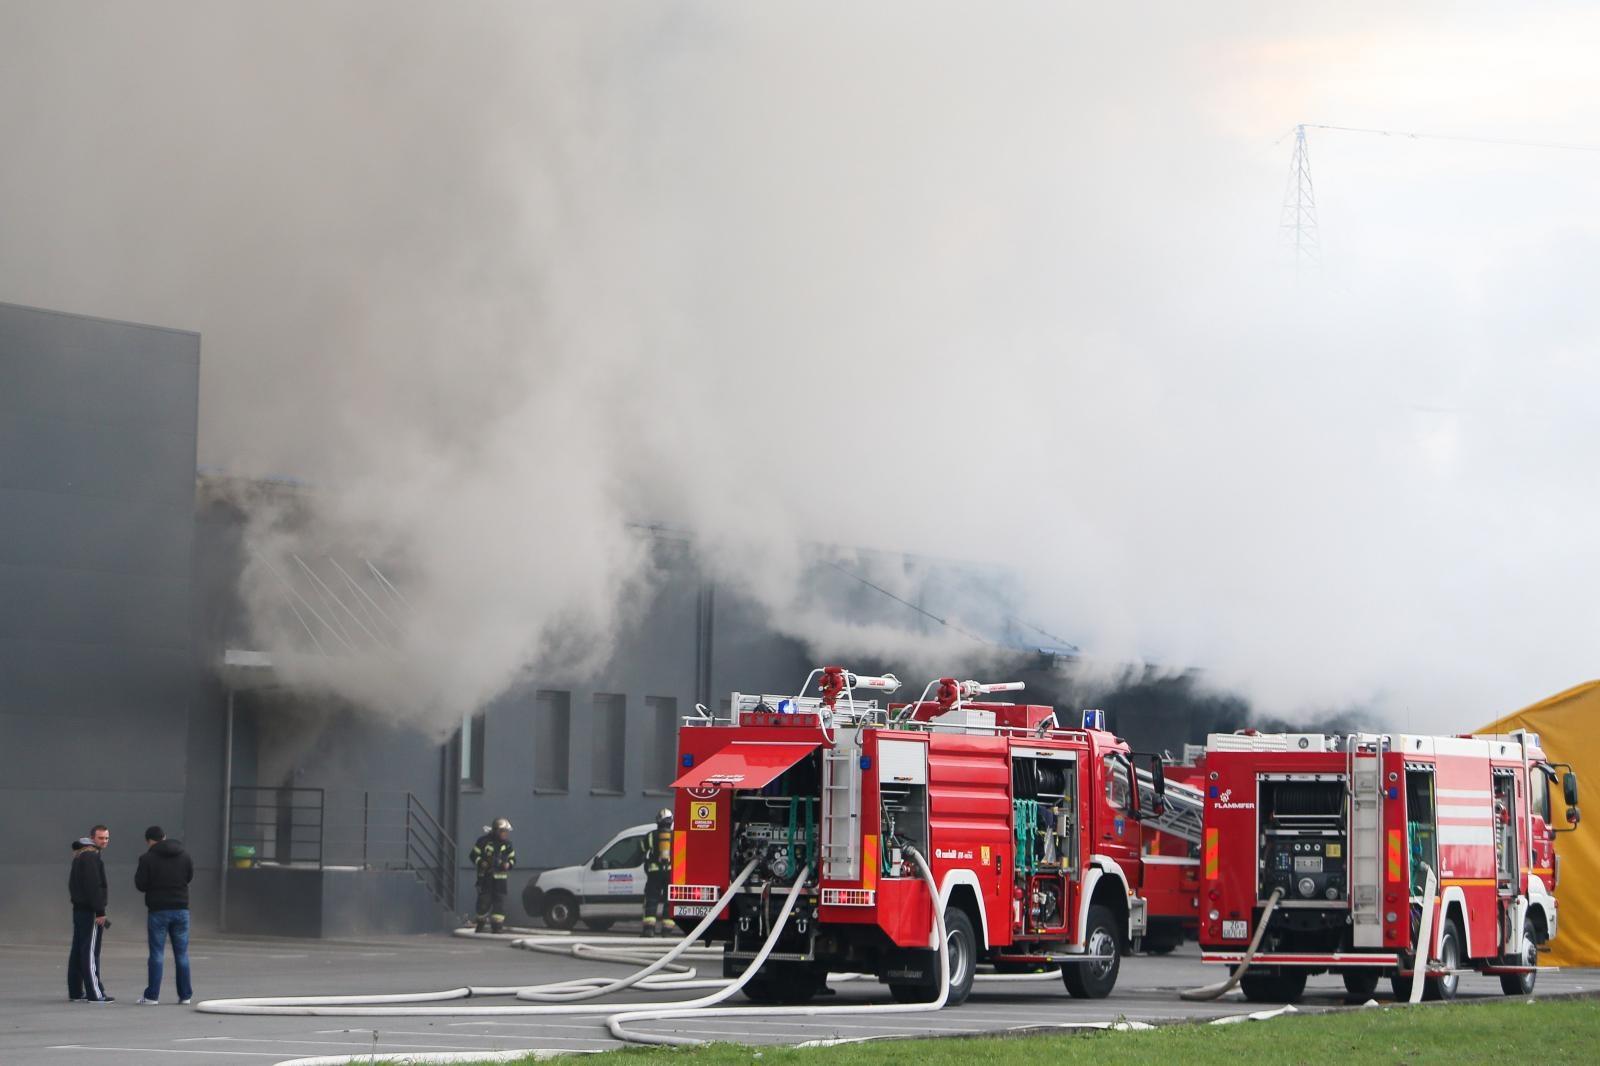 Ugašen požar u skladišu Prime u Sesvetama